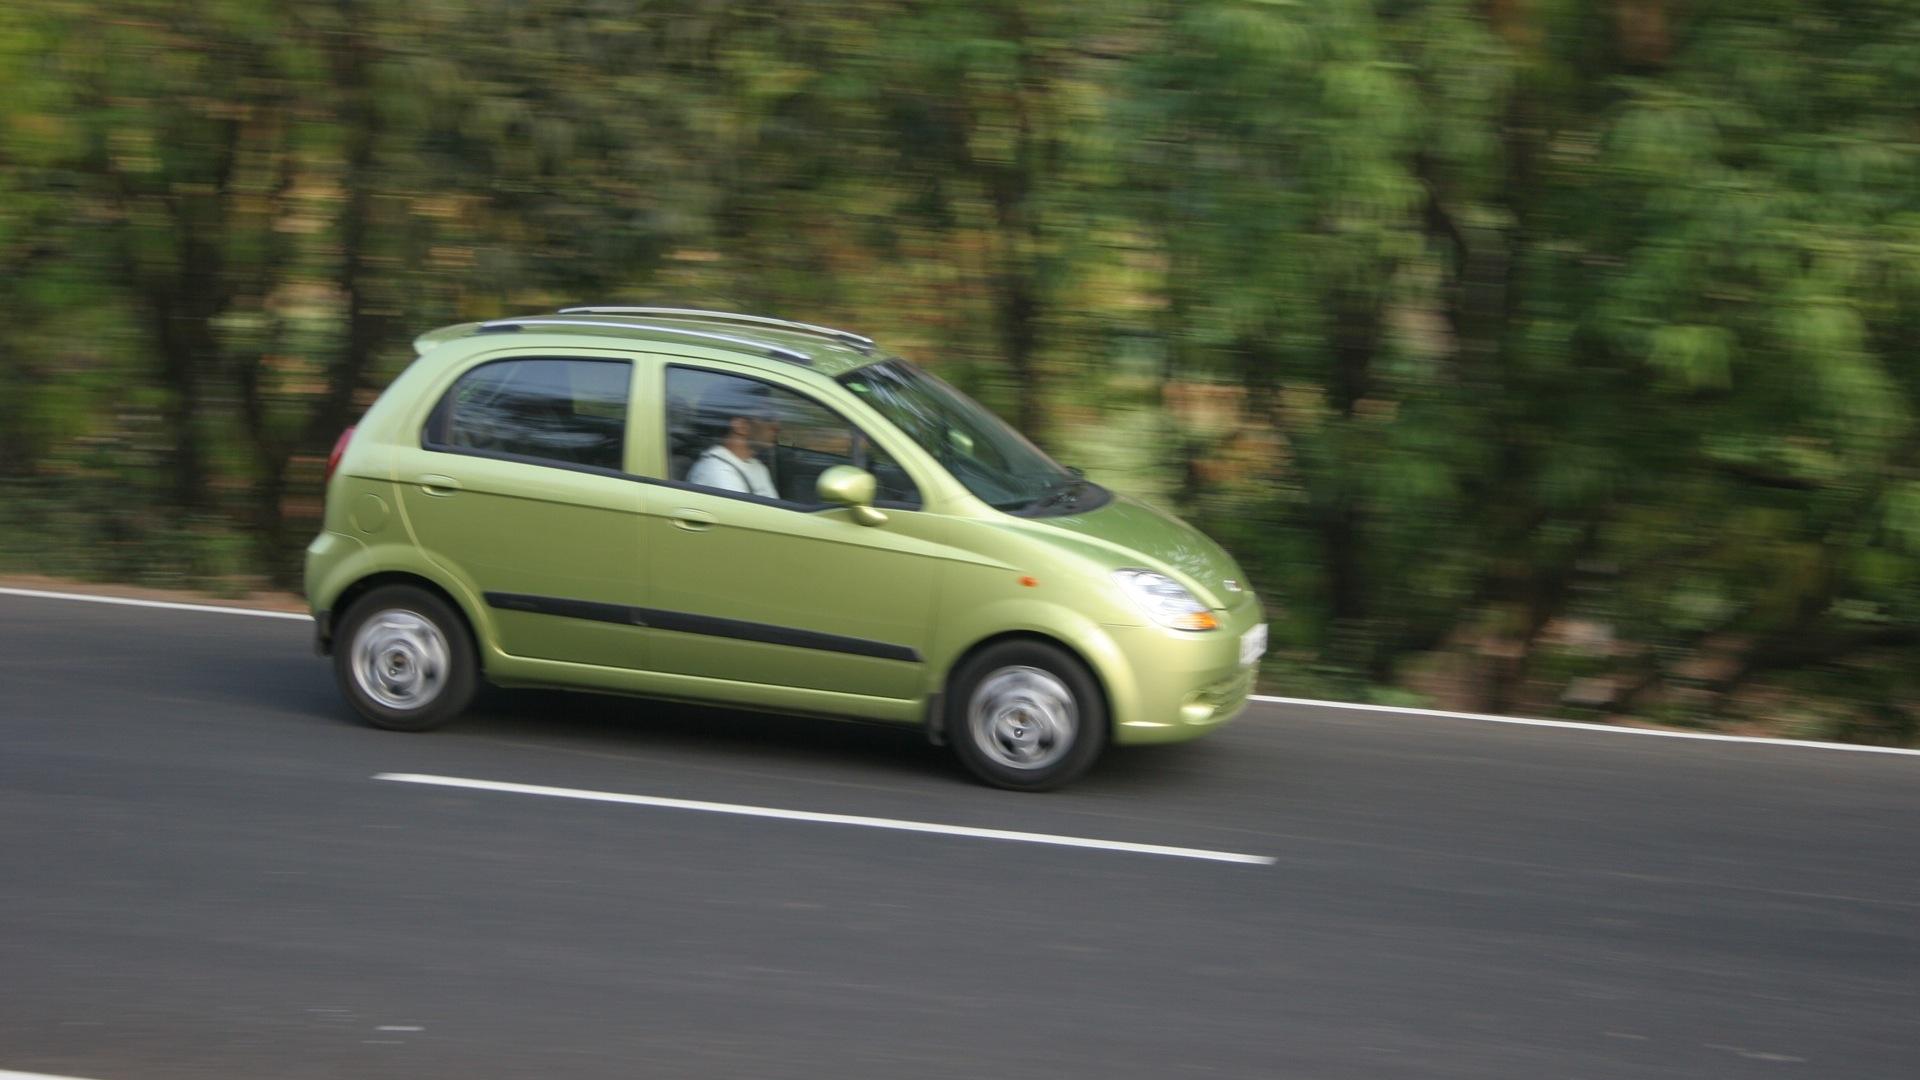 Chevrolet-Spark-2013-Base-Exterior